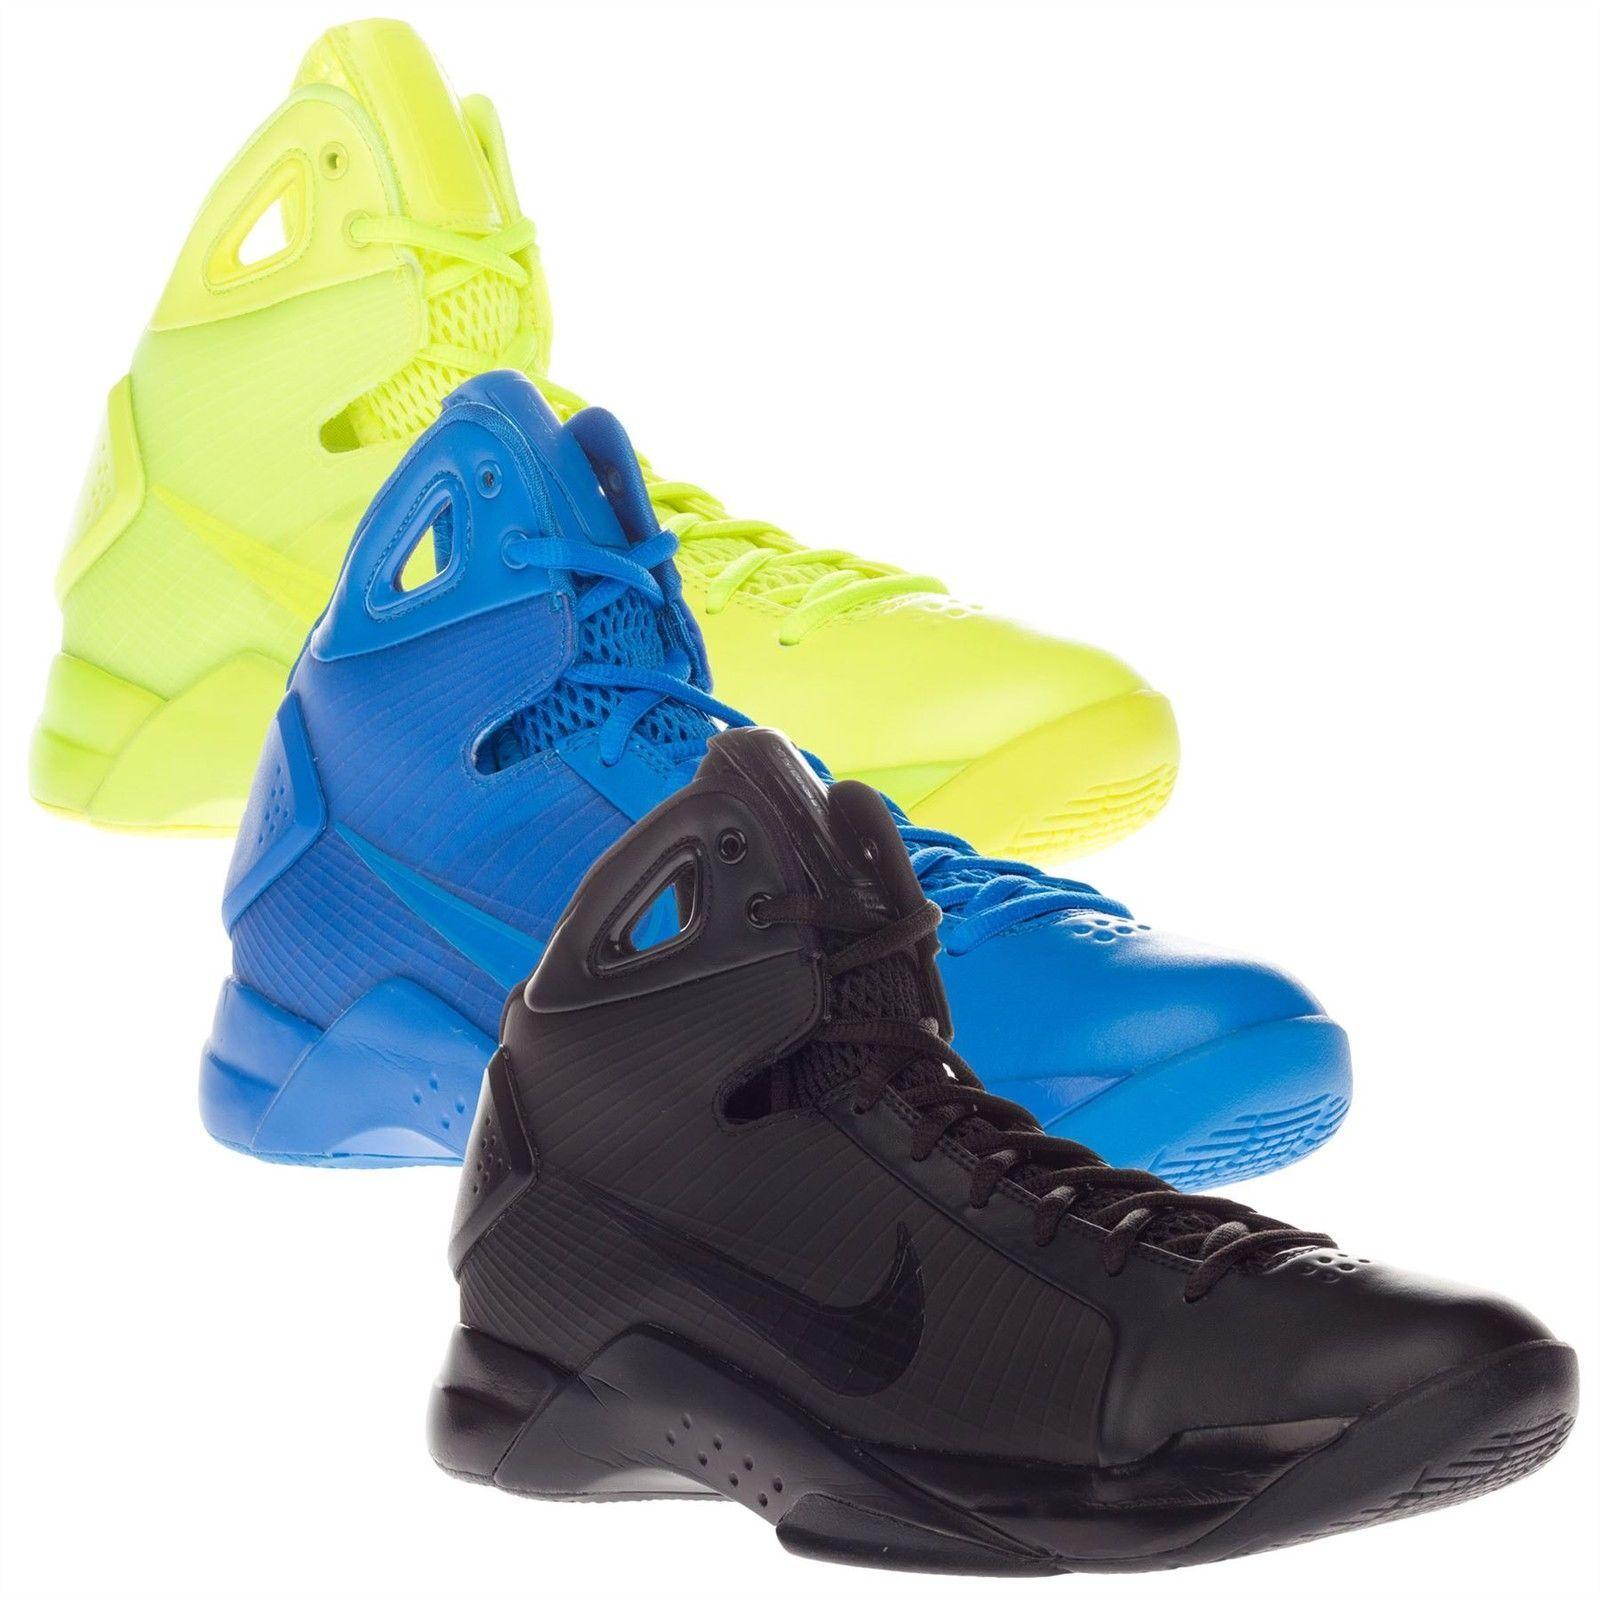 Nike Men's Hyperdunk '08 Trainers Retro High Top Basketball Running Trainers